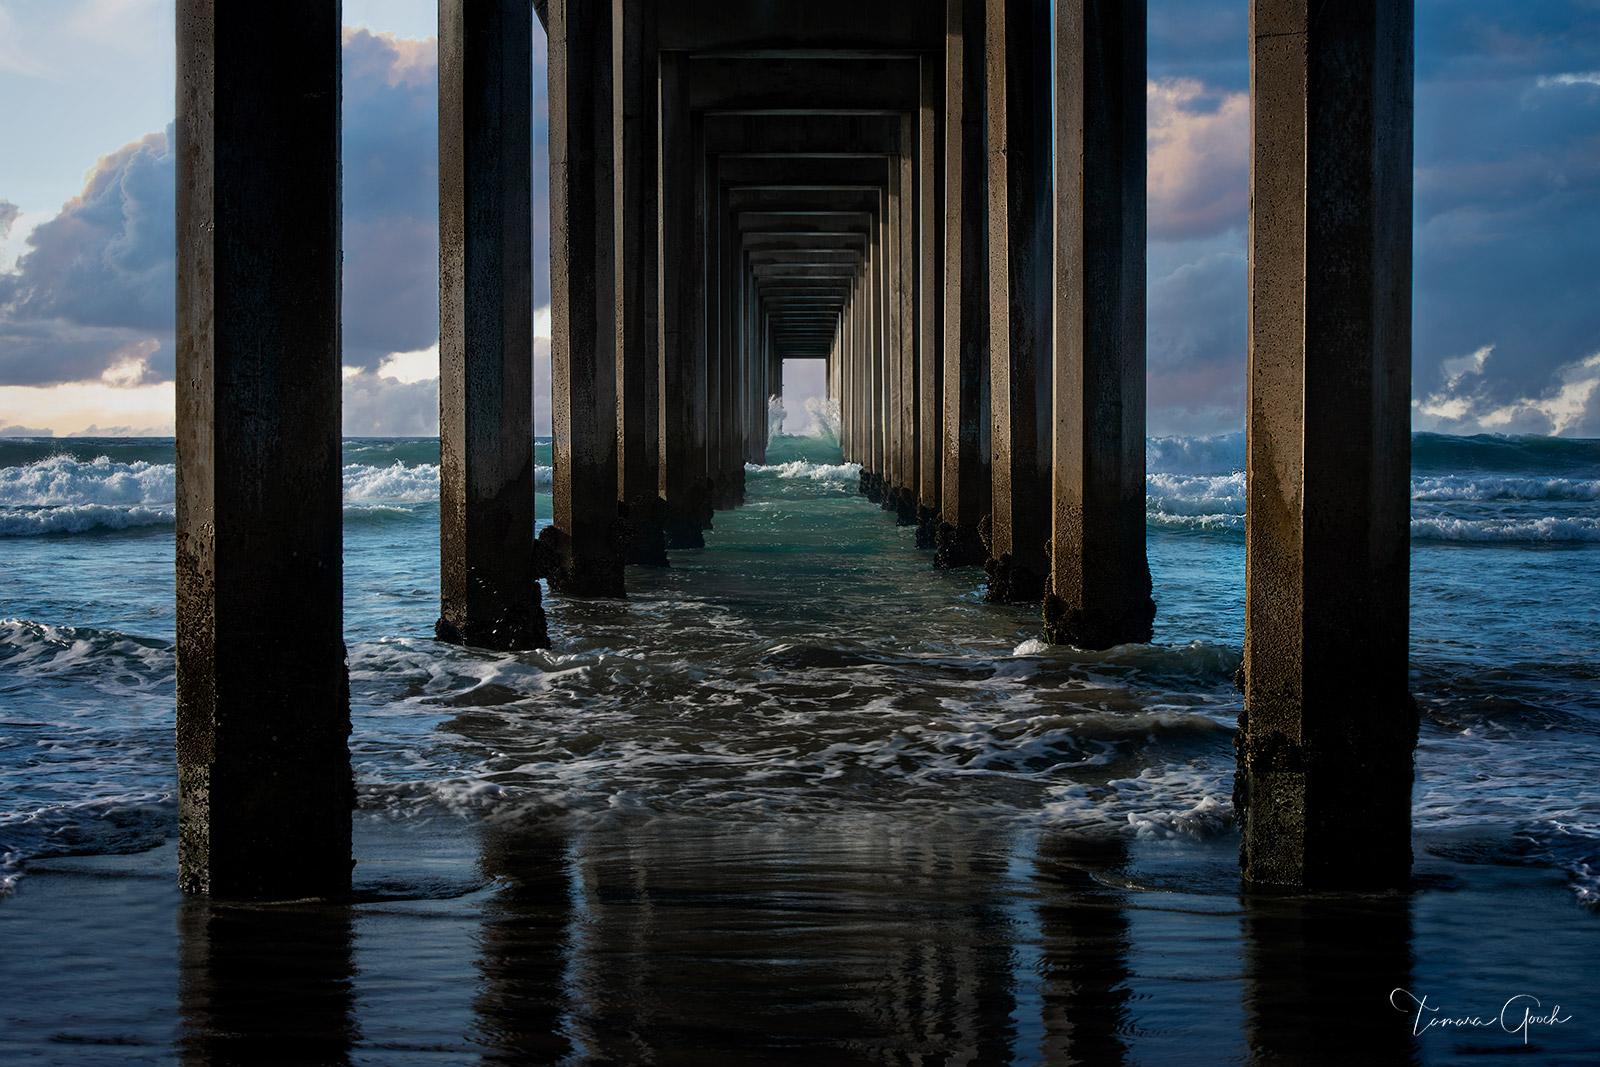 pier, fascination, beach, ocean, sea, waves, clouds, sky, pilings, nature, Scripps pier, Scripps, Lumachrome, acrylic, interior design, home decor, living, coast, coastal, coastal living, lifestyle, , photo